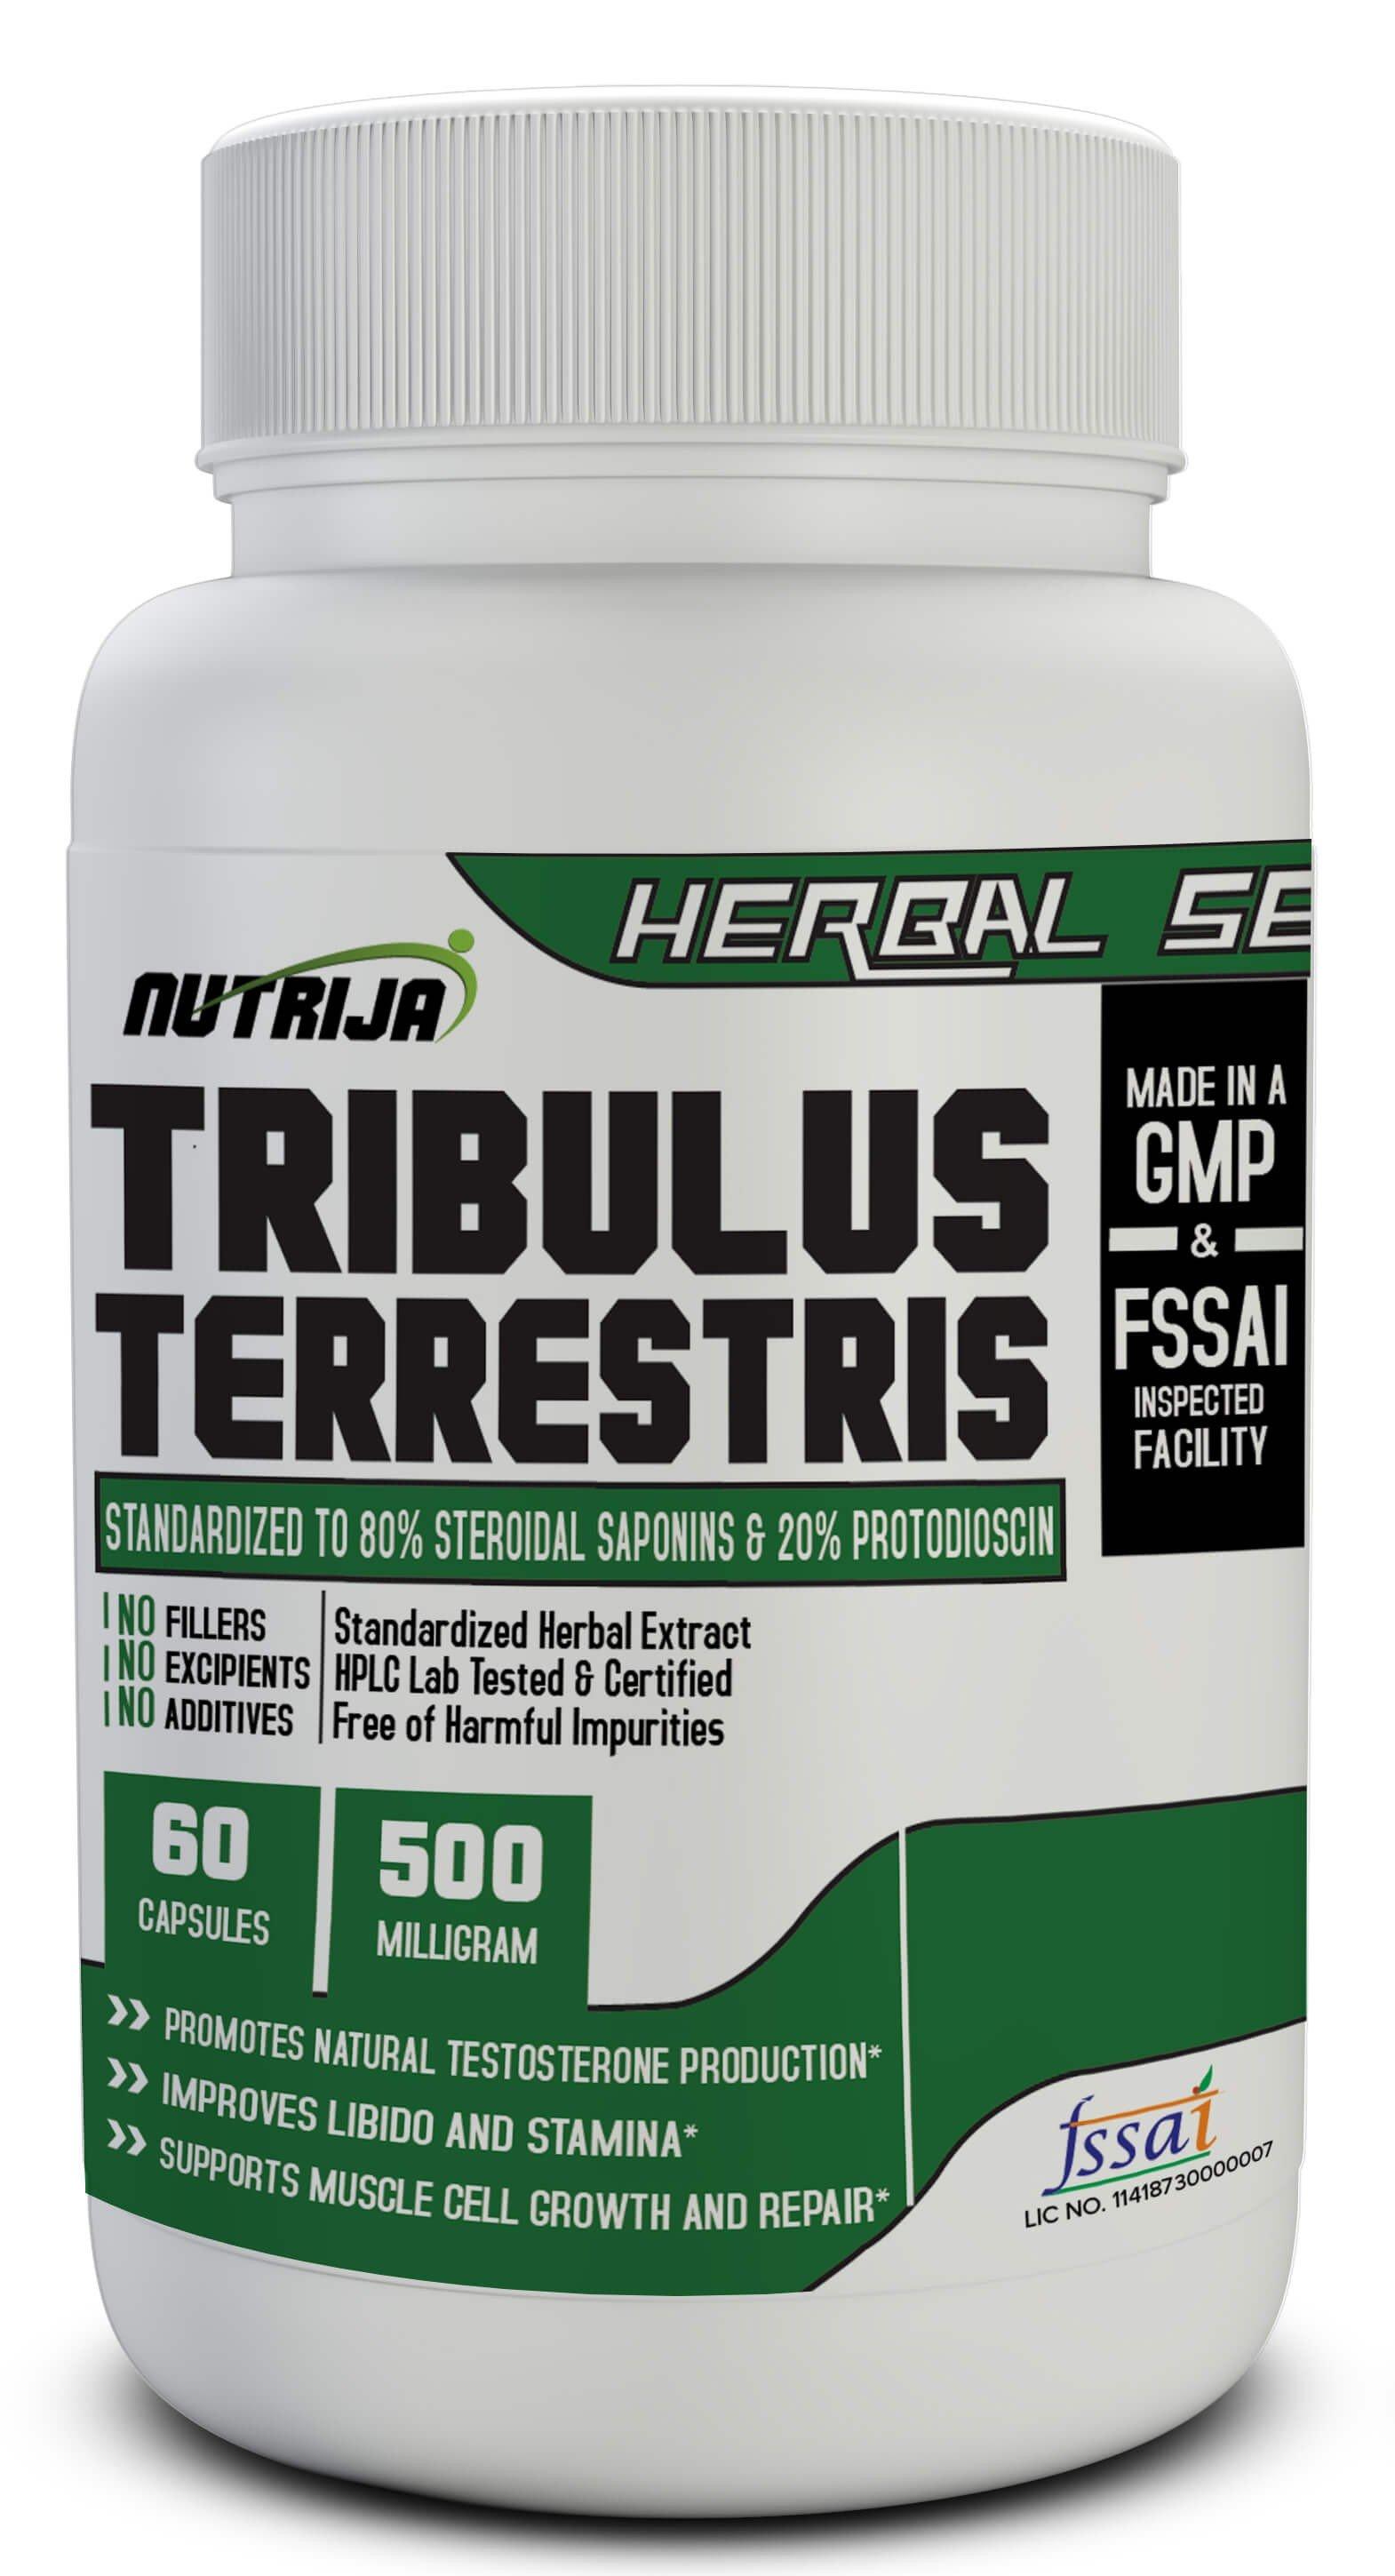 Buy Tribulus Terrestris Extract Capsules In India Nutrija Capsulespills Tablets